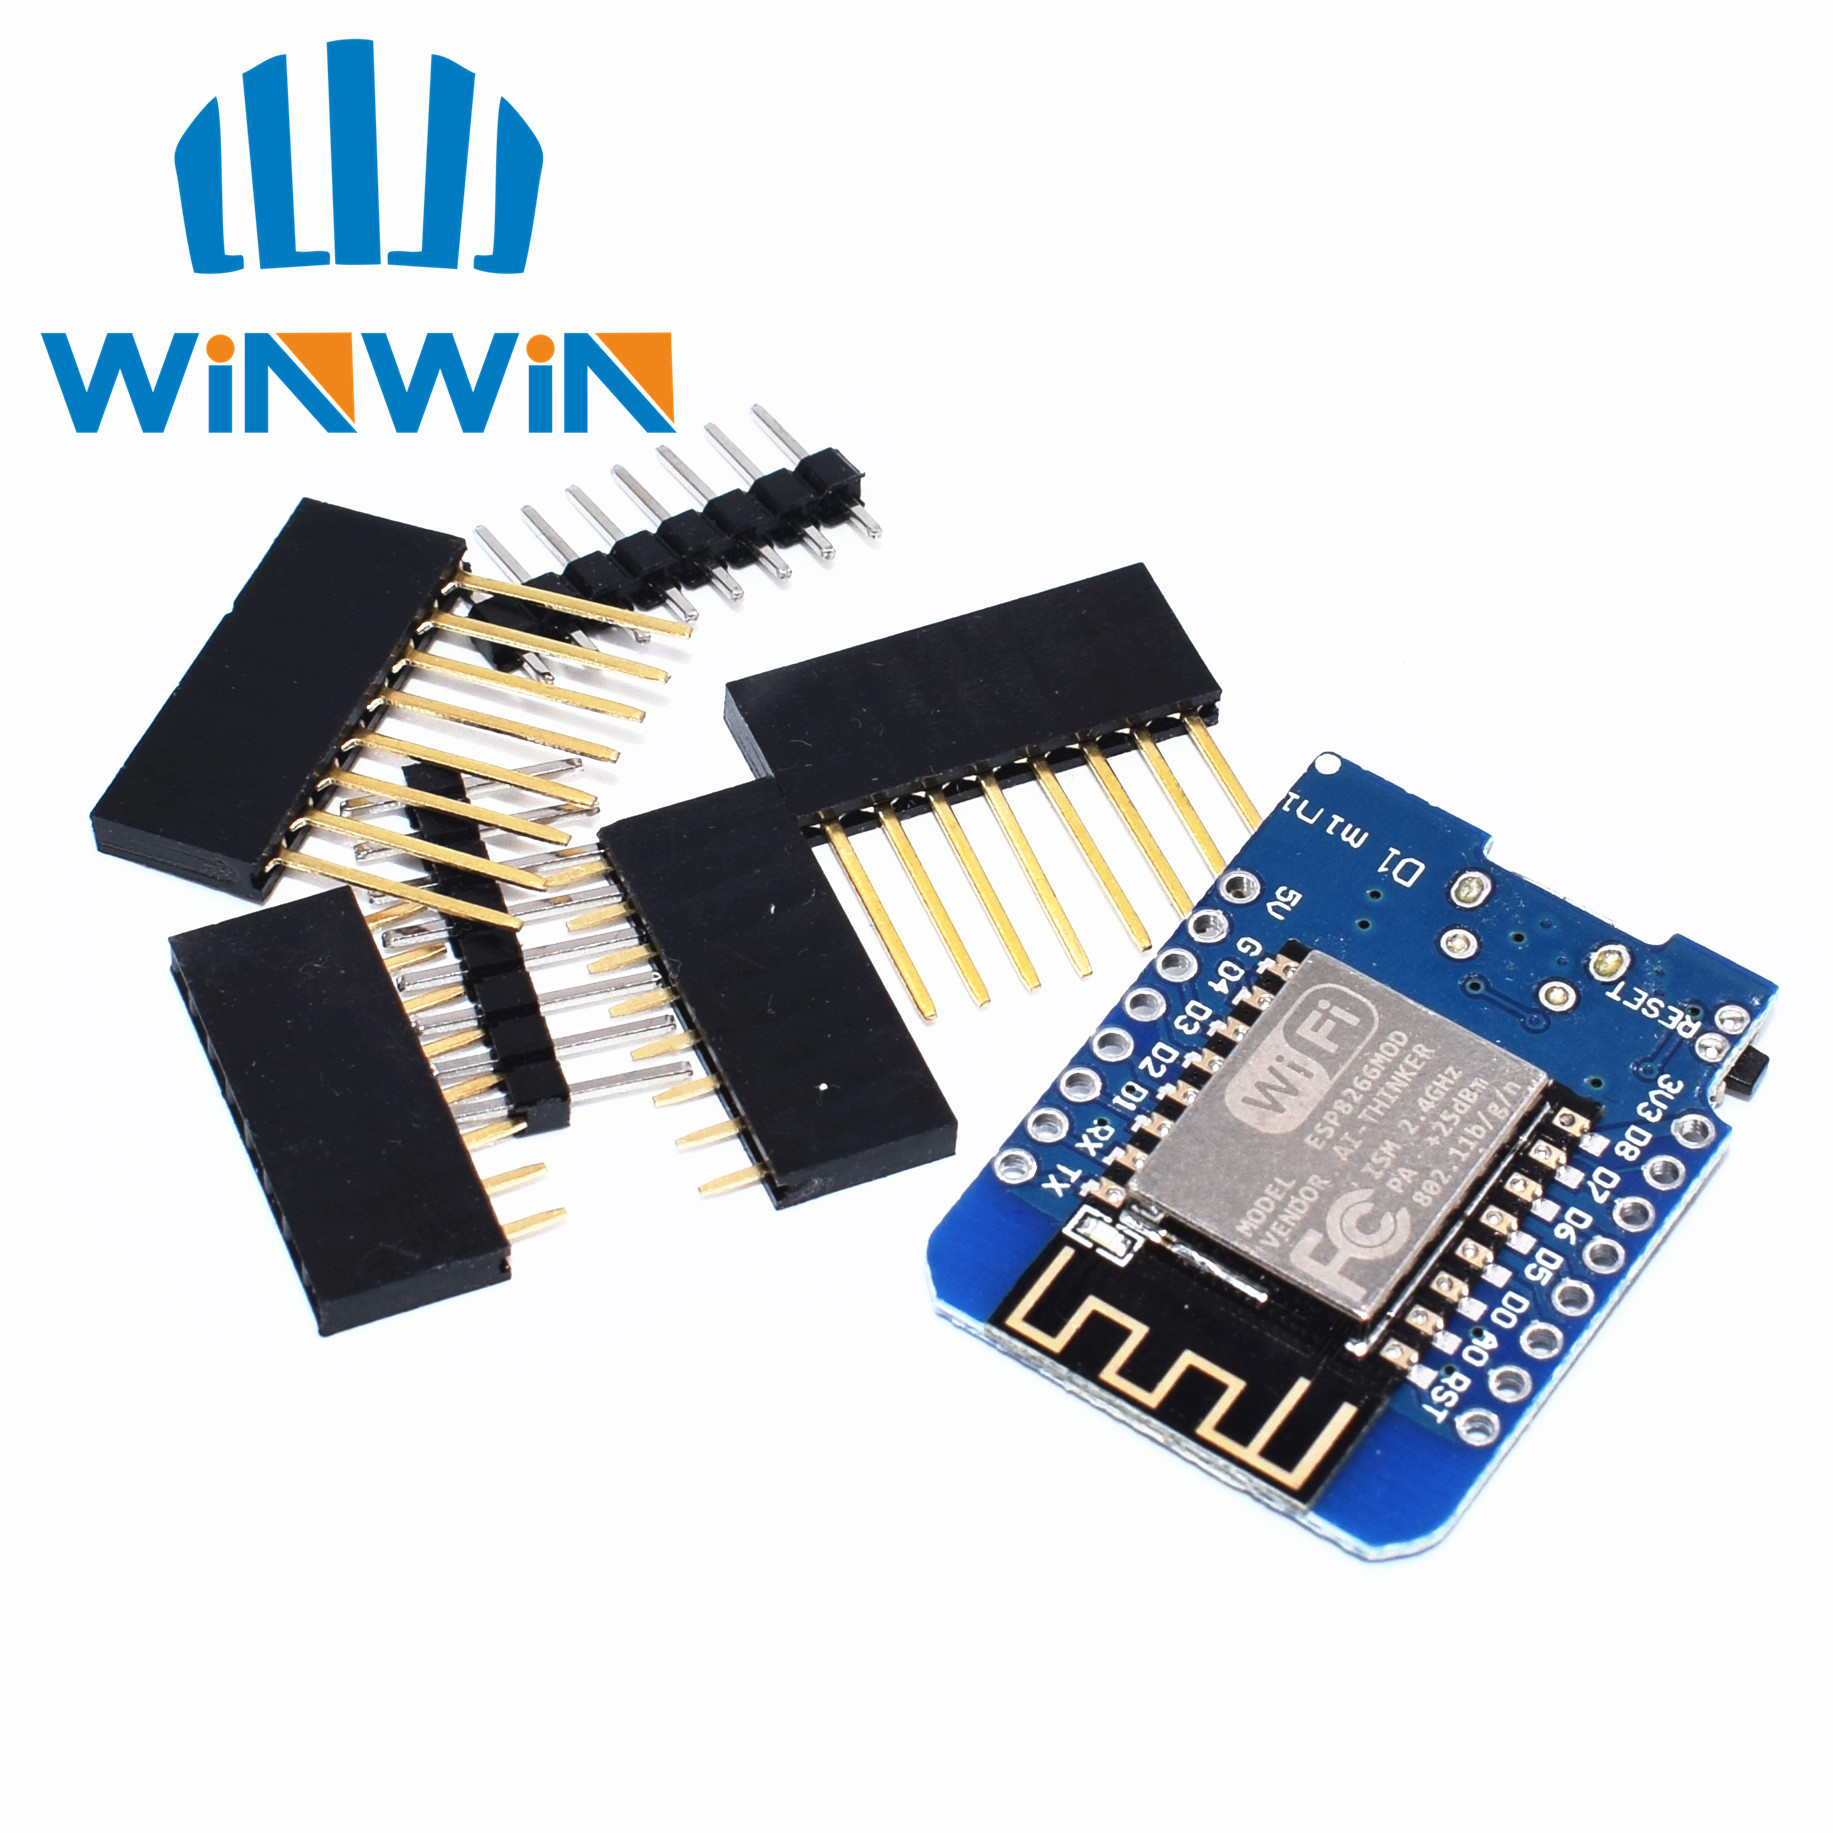 esp8266-esp-12-esp-12f-ch340g-ch340-v2-usb-wemos-d1-mini-wifi-development-board-d1-mini-nodemcu-lua-iot-board-33v-with-pins